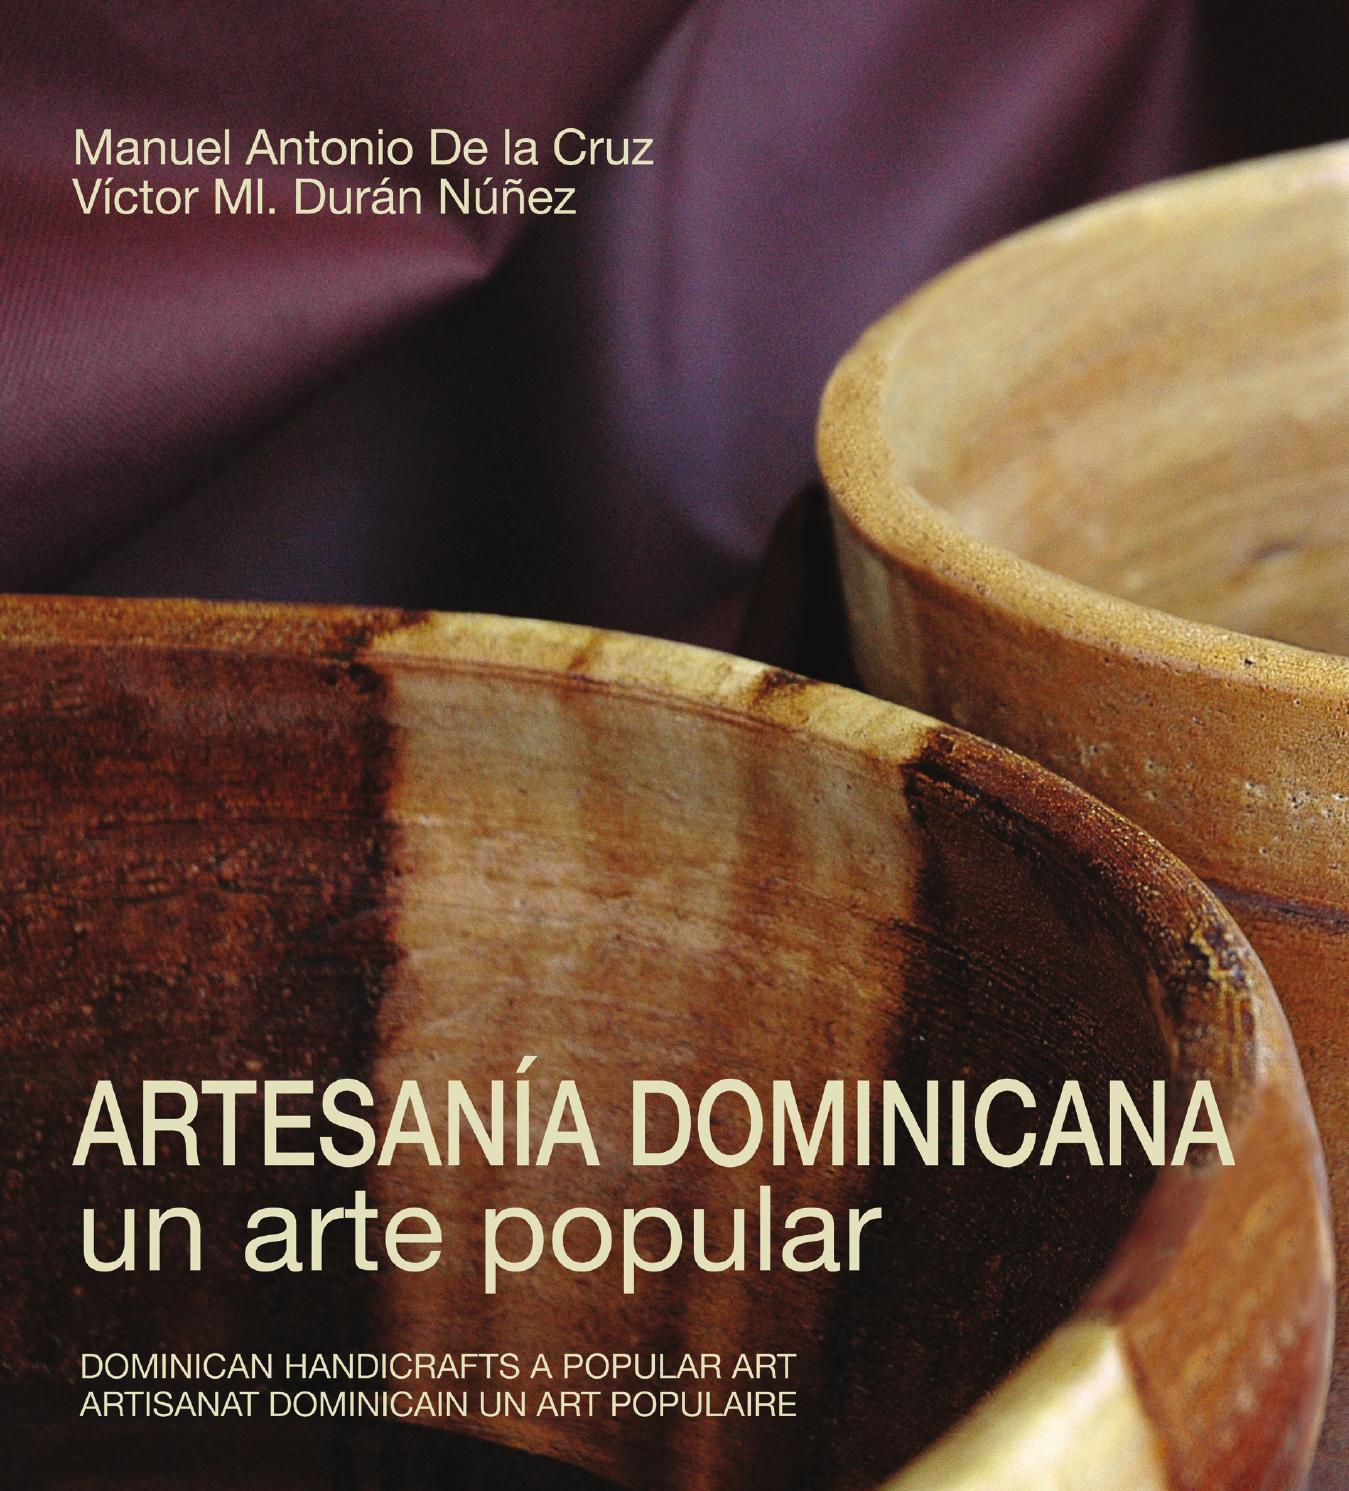 Artesan A Dominicana Un Arte Popular By Banco Popular Dominicano